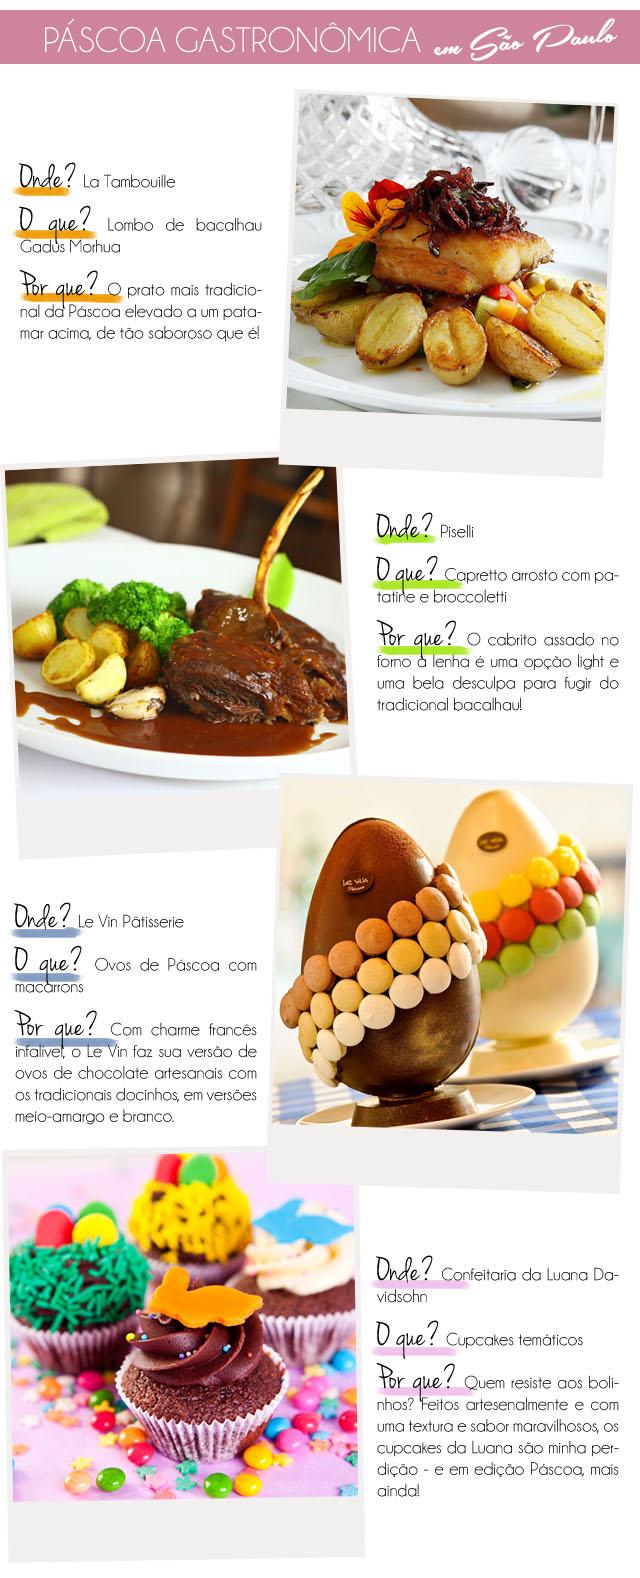 blog-da-alice-ferraz-pascoa-gastronomica-sp